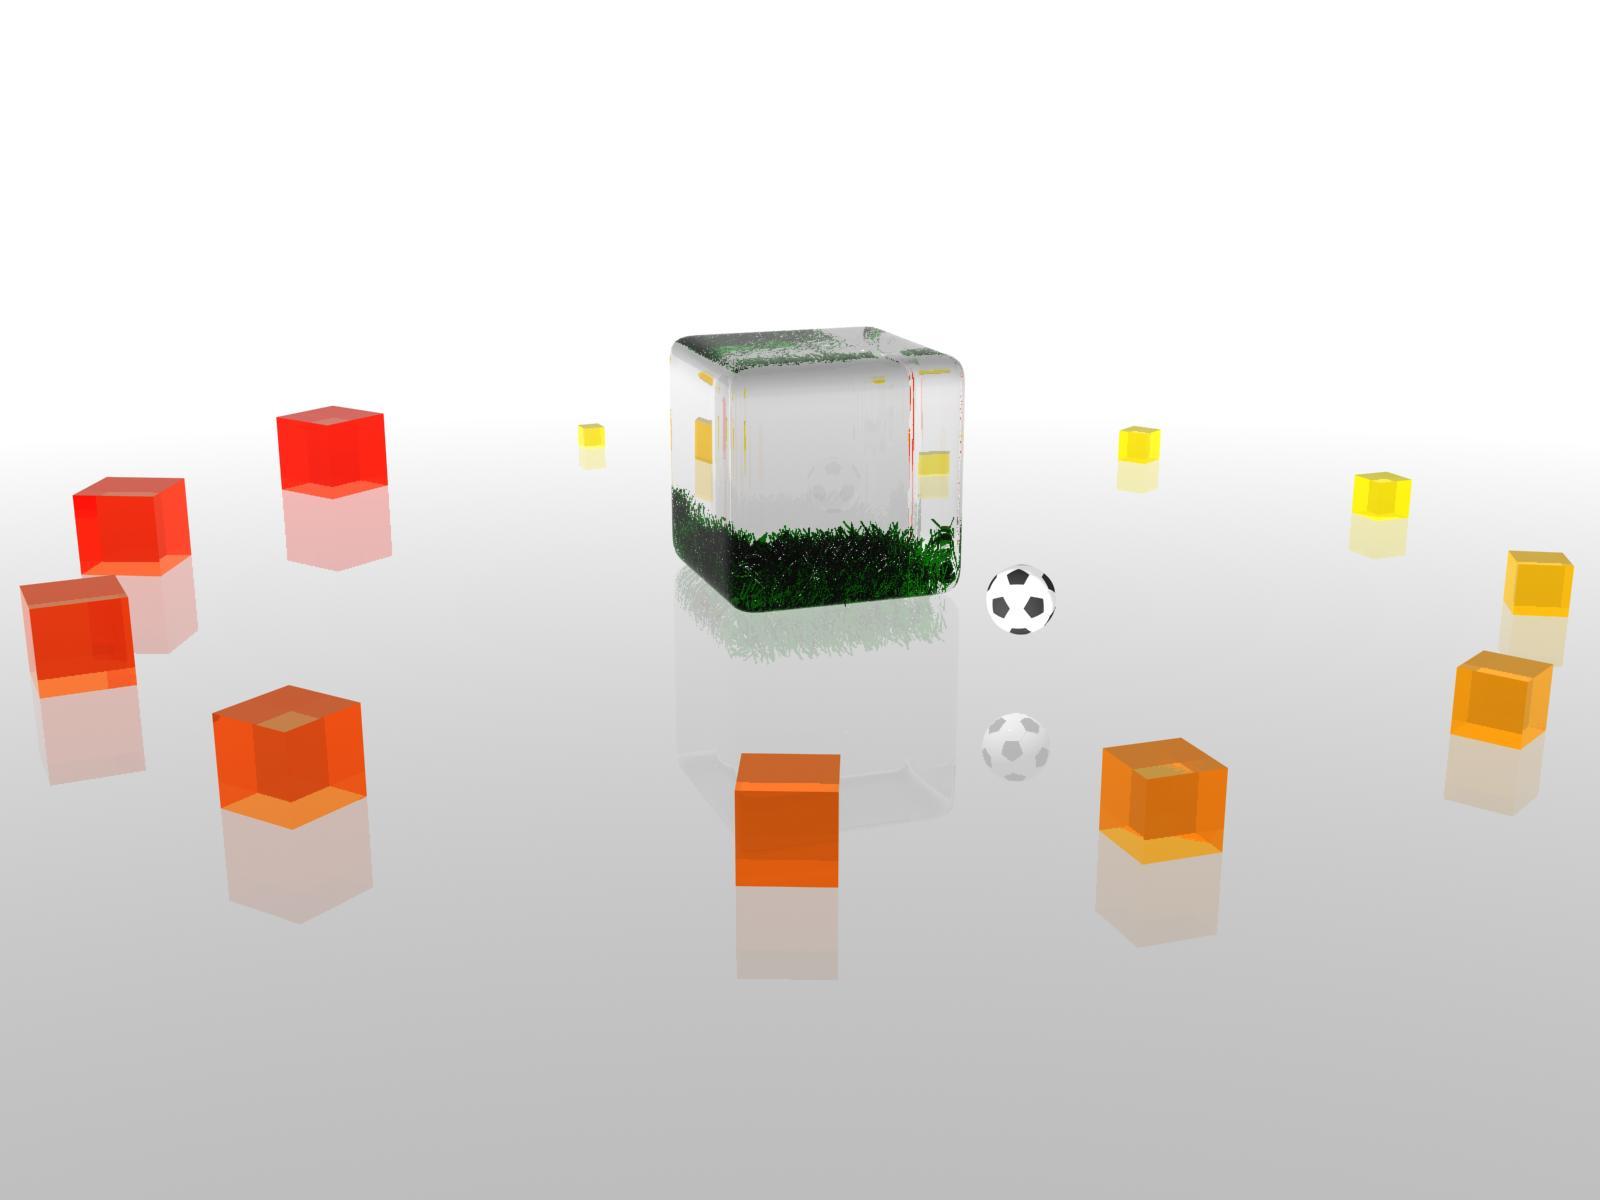 Summer cube